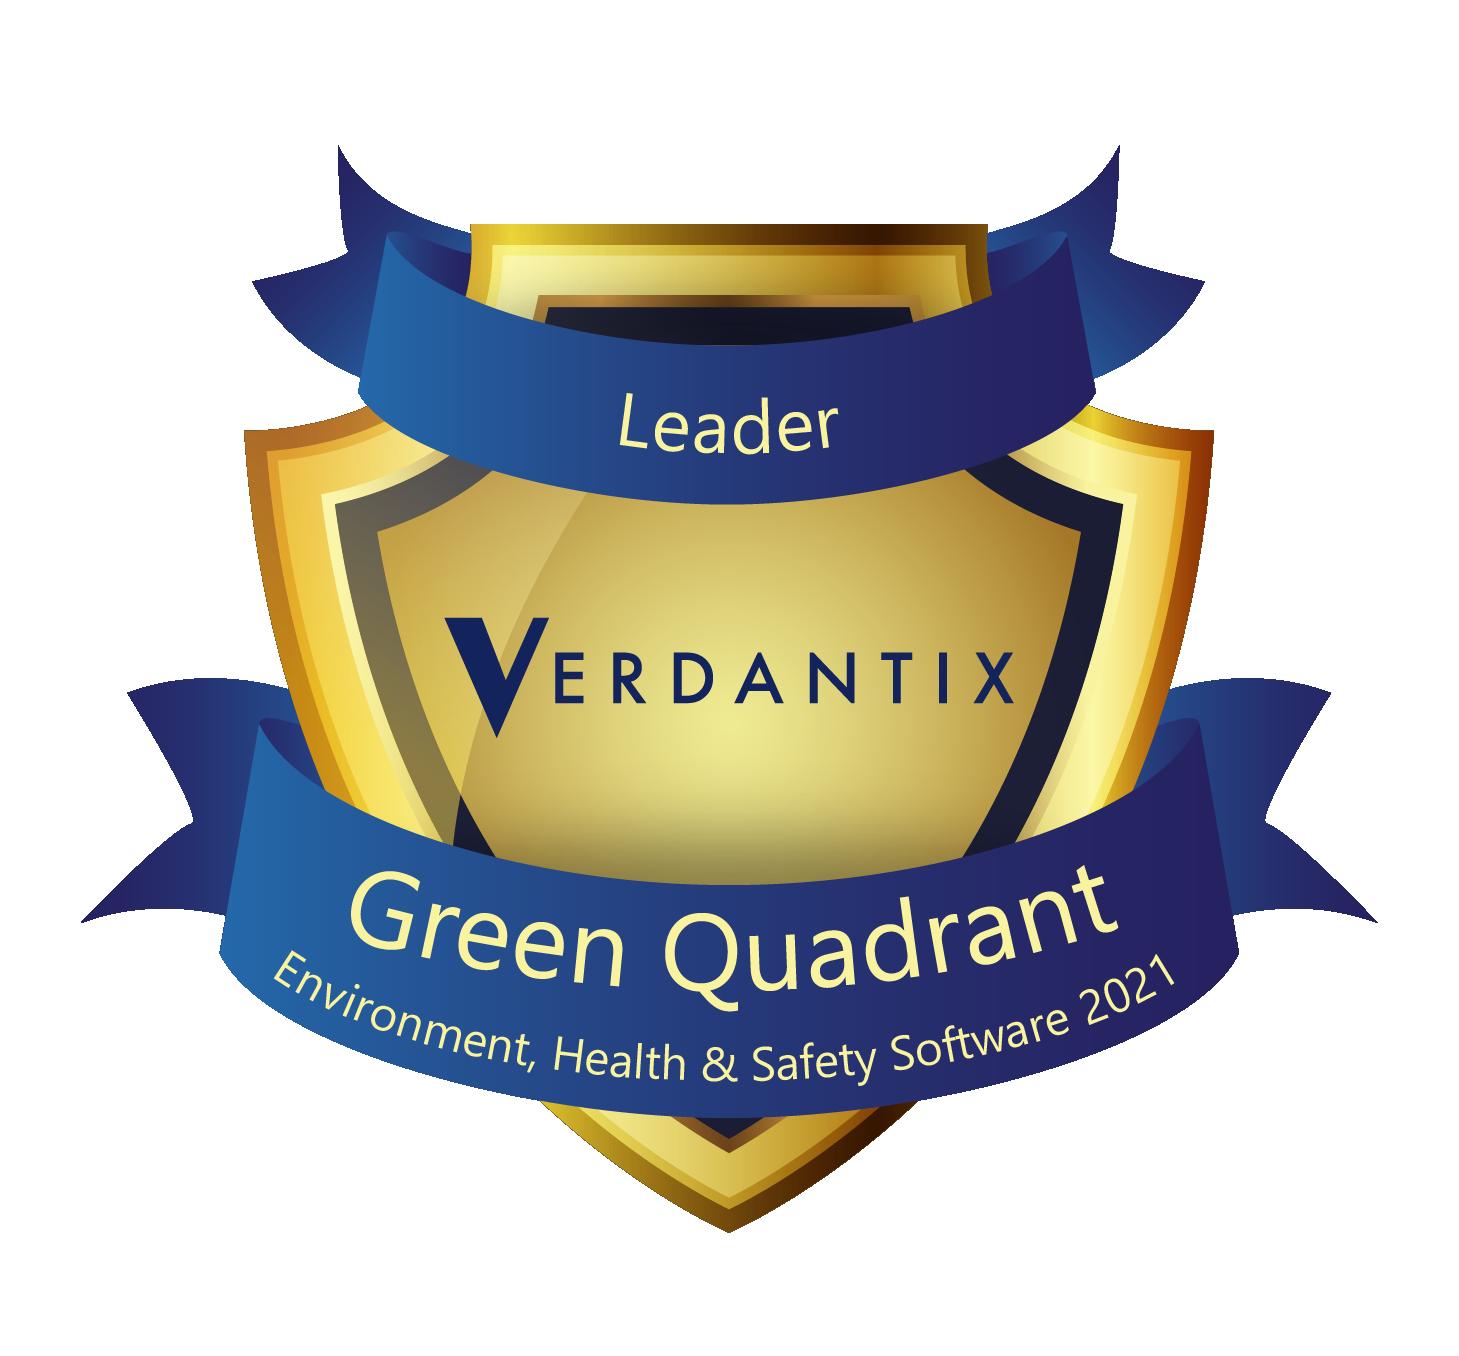 Verdantix Green Quadrant_Leader